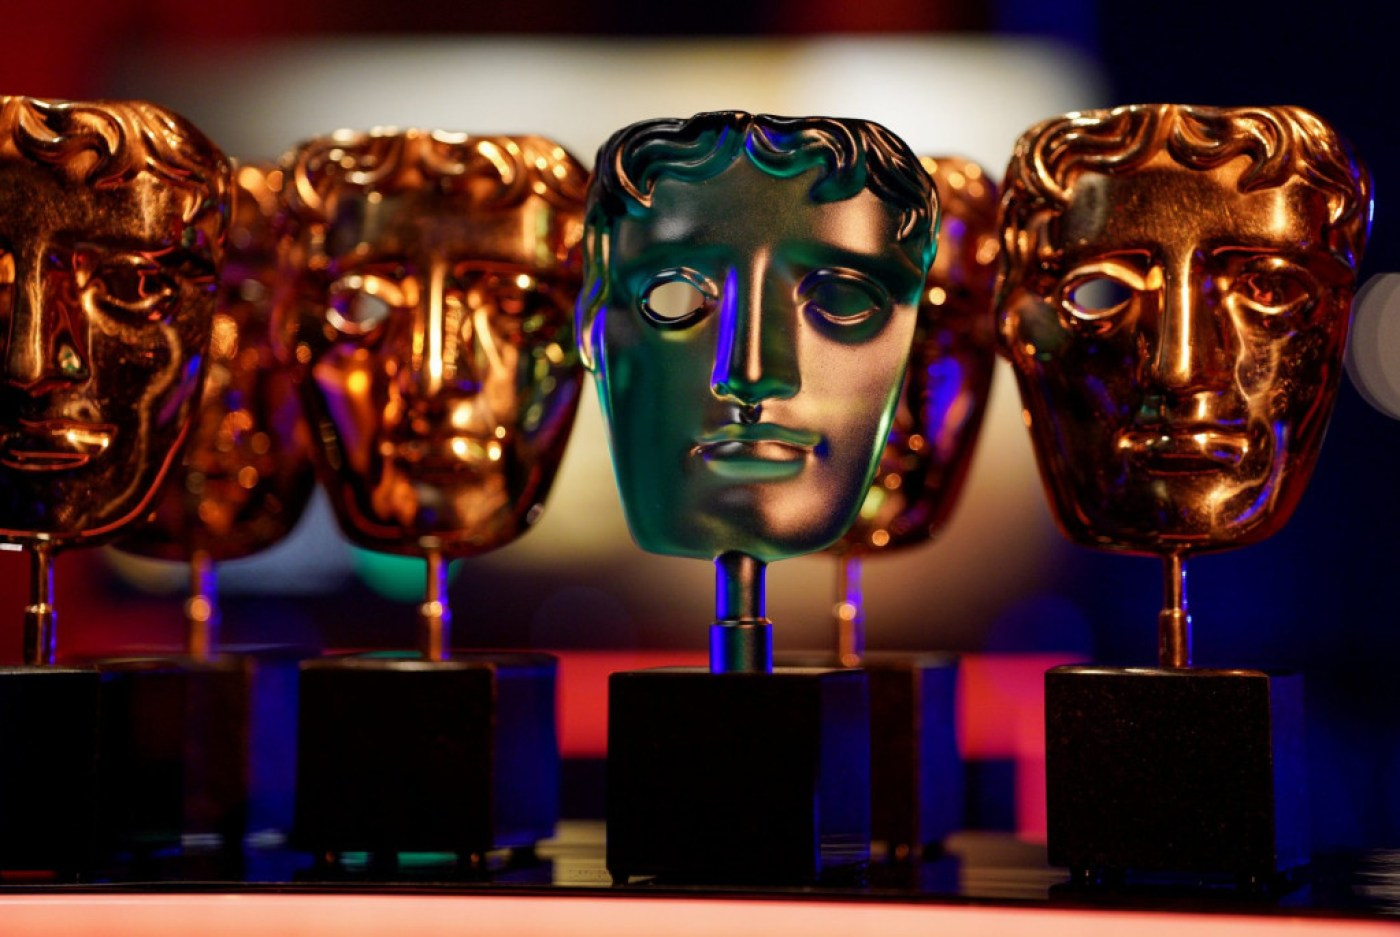 BAFTA TV Awards 2021 winners announced | ബാഫ്ത ടിവി അവാർഡ് 2021 വിജയികളെ പ്രഖ്യാപിച്ചു_40.1